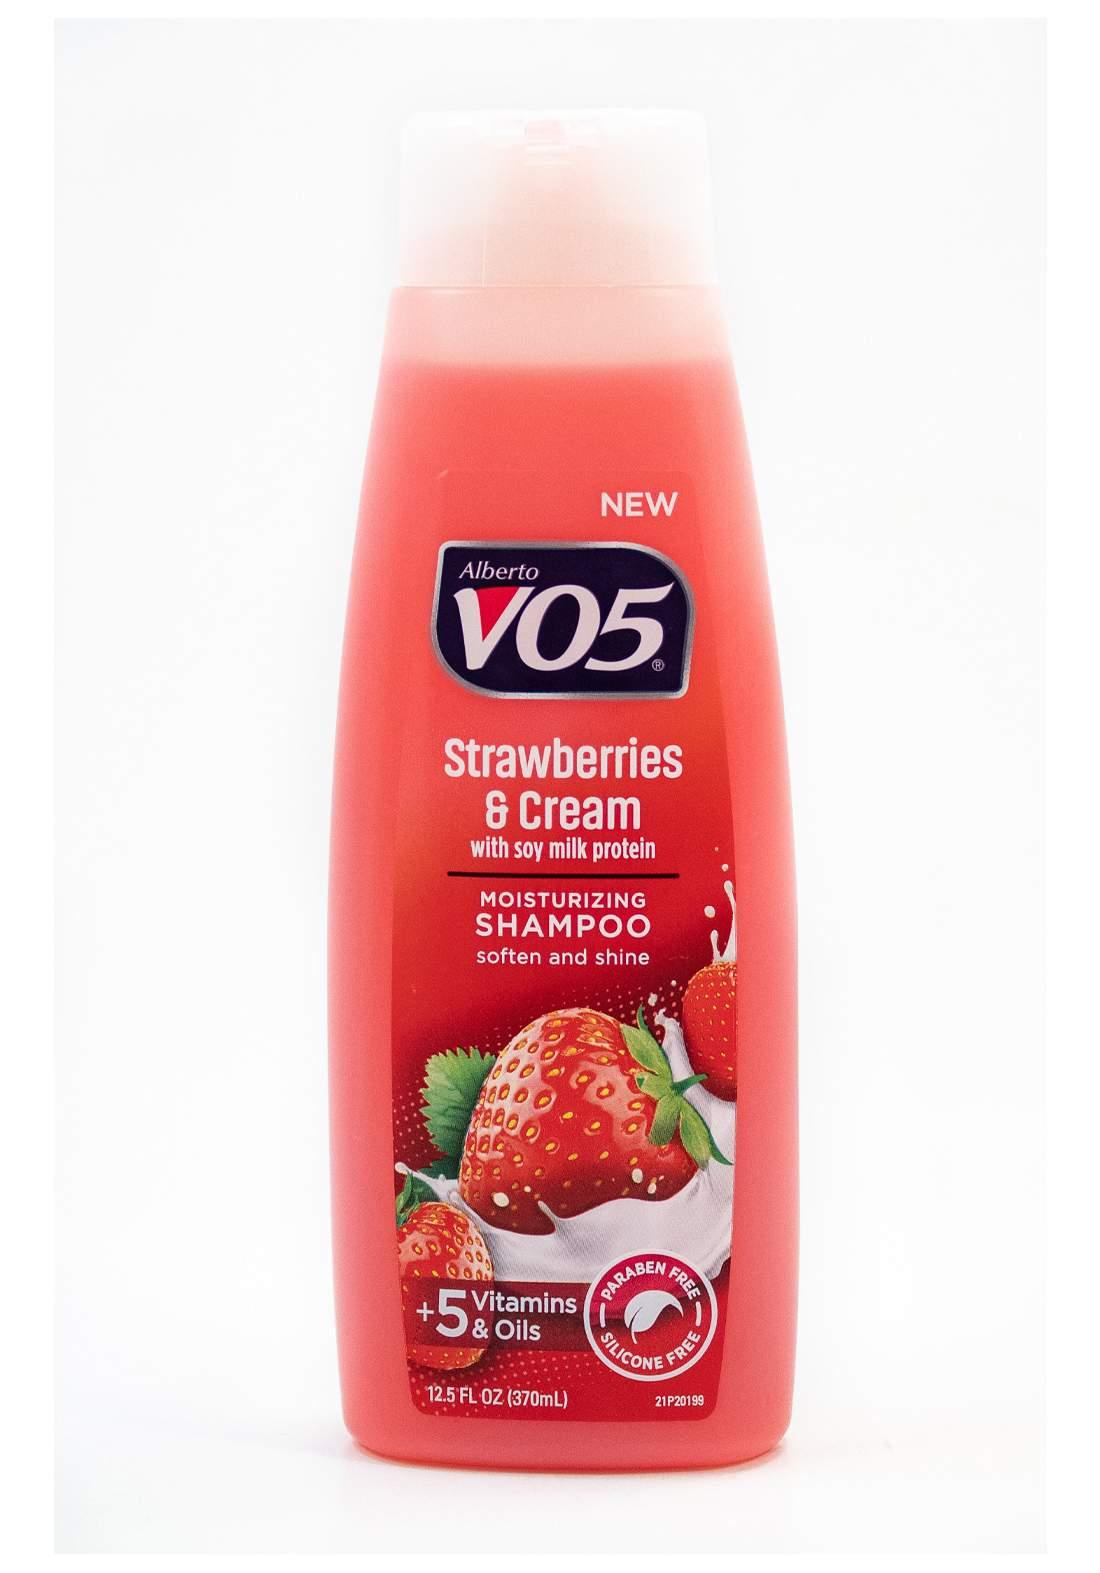 VO5 Strawberry And Cream Shampoo 370 ml شامبو للشعر